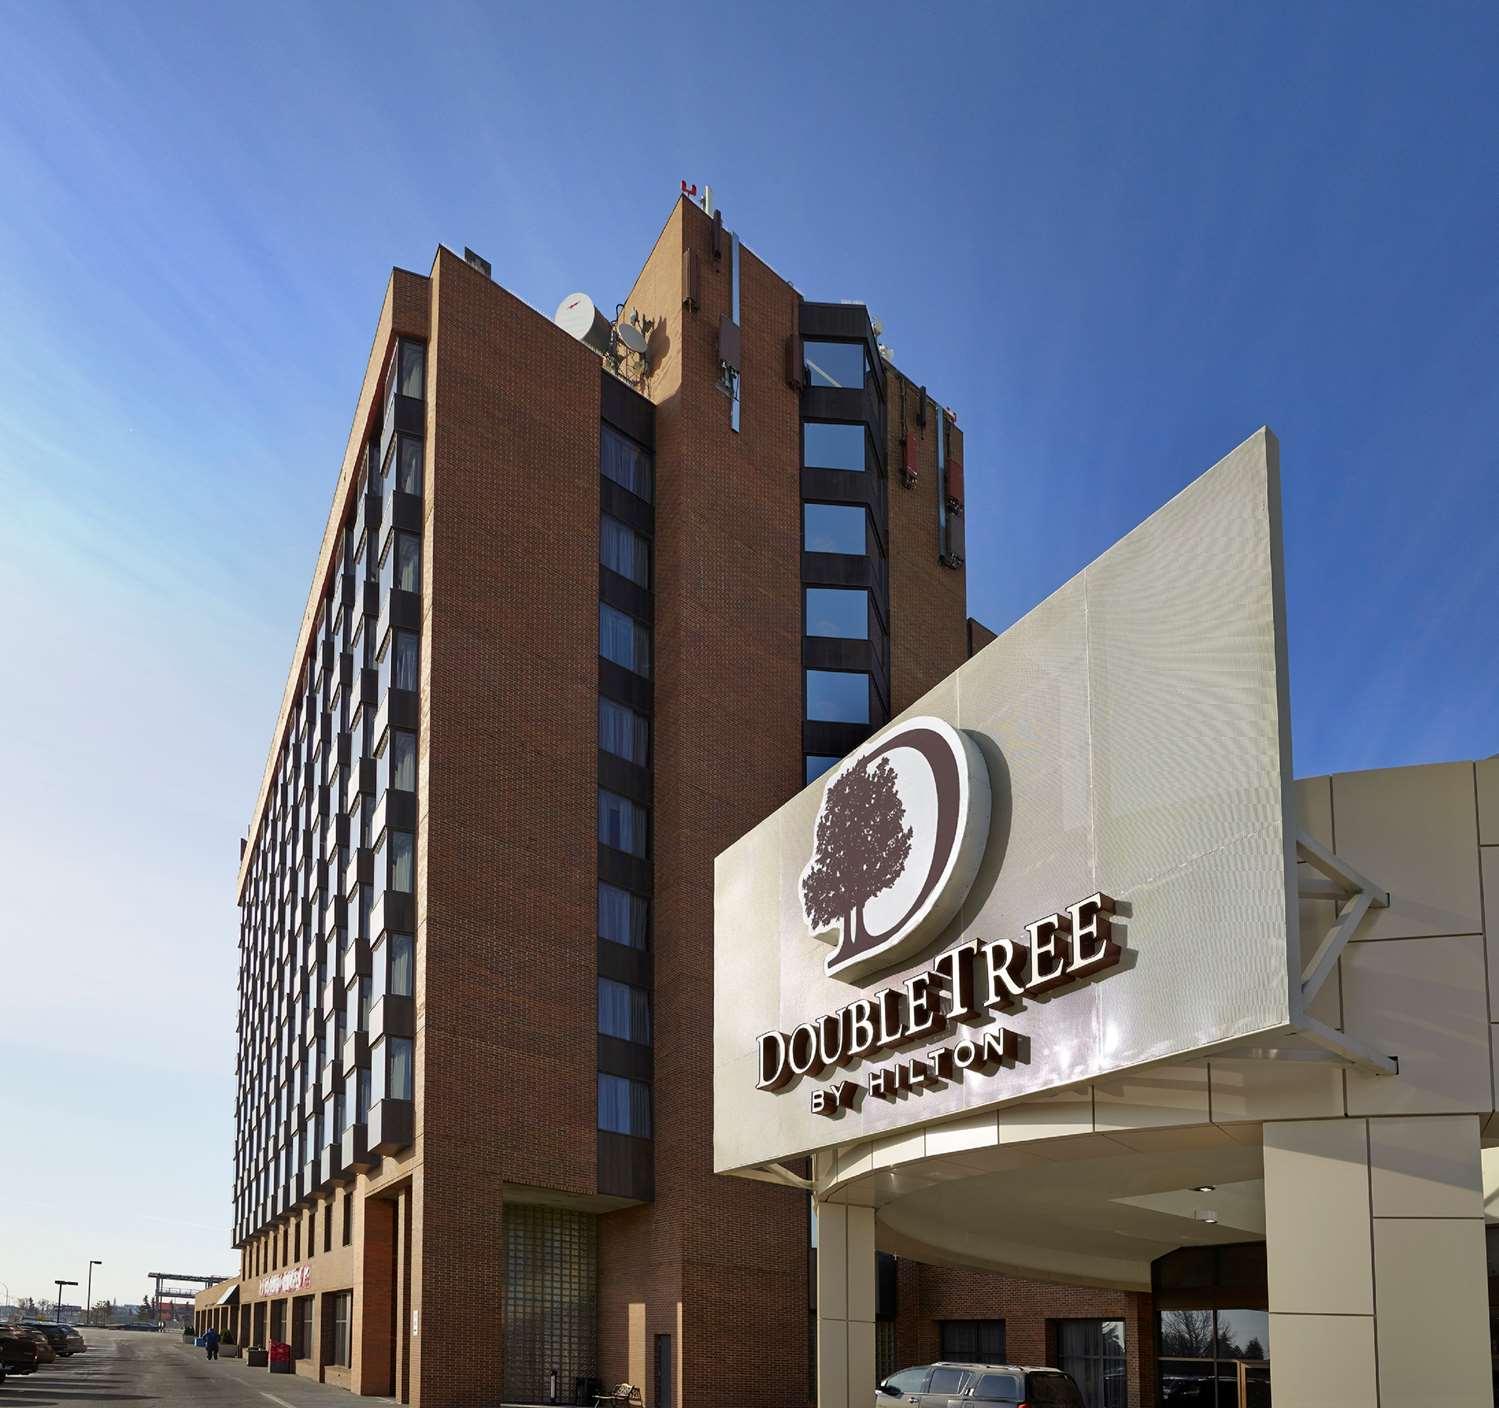 Lasseters hotel and casino alice springs australia